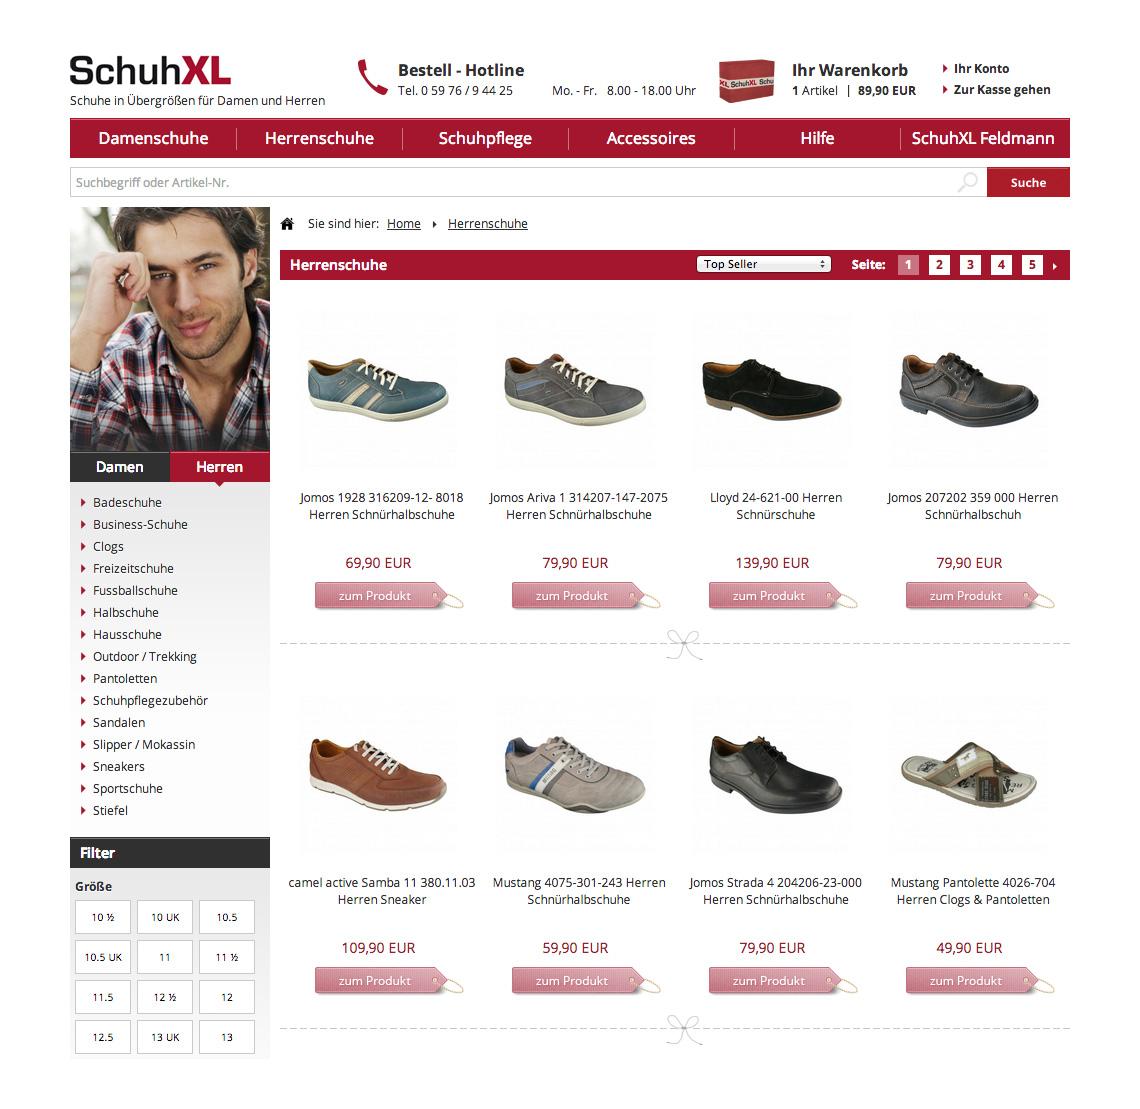 SchuhXL Bewertungsfunktion